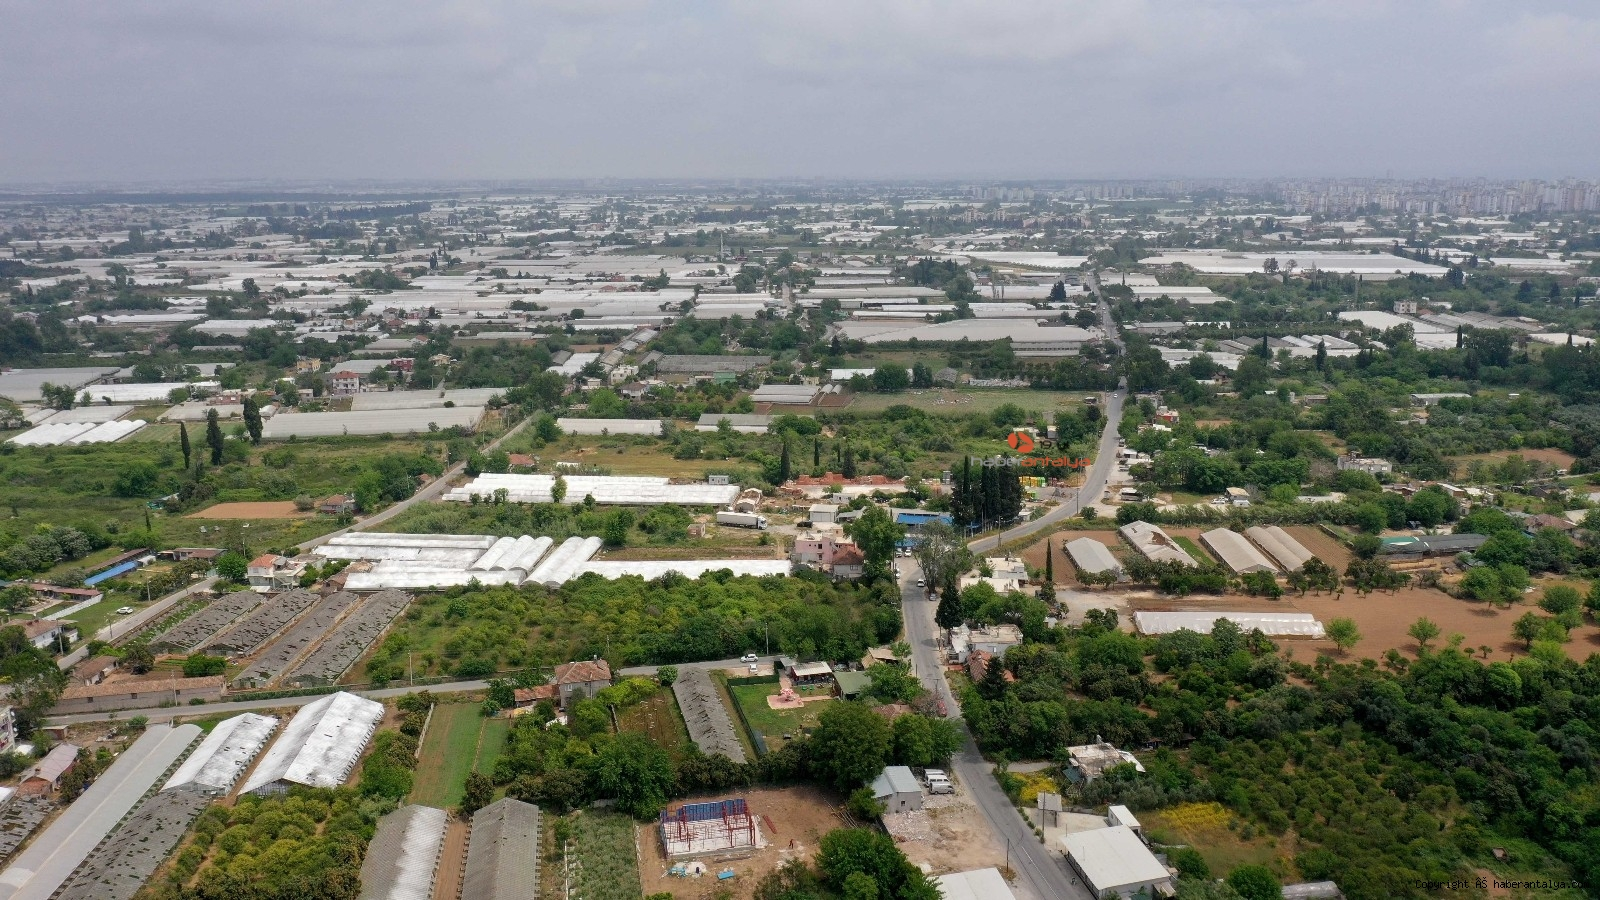 2021/05/arap-sacina-donen-kircamiye-43-kilometrelik-asfalt-agi--20210510AW31-1.jpg